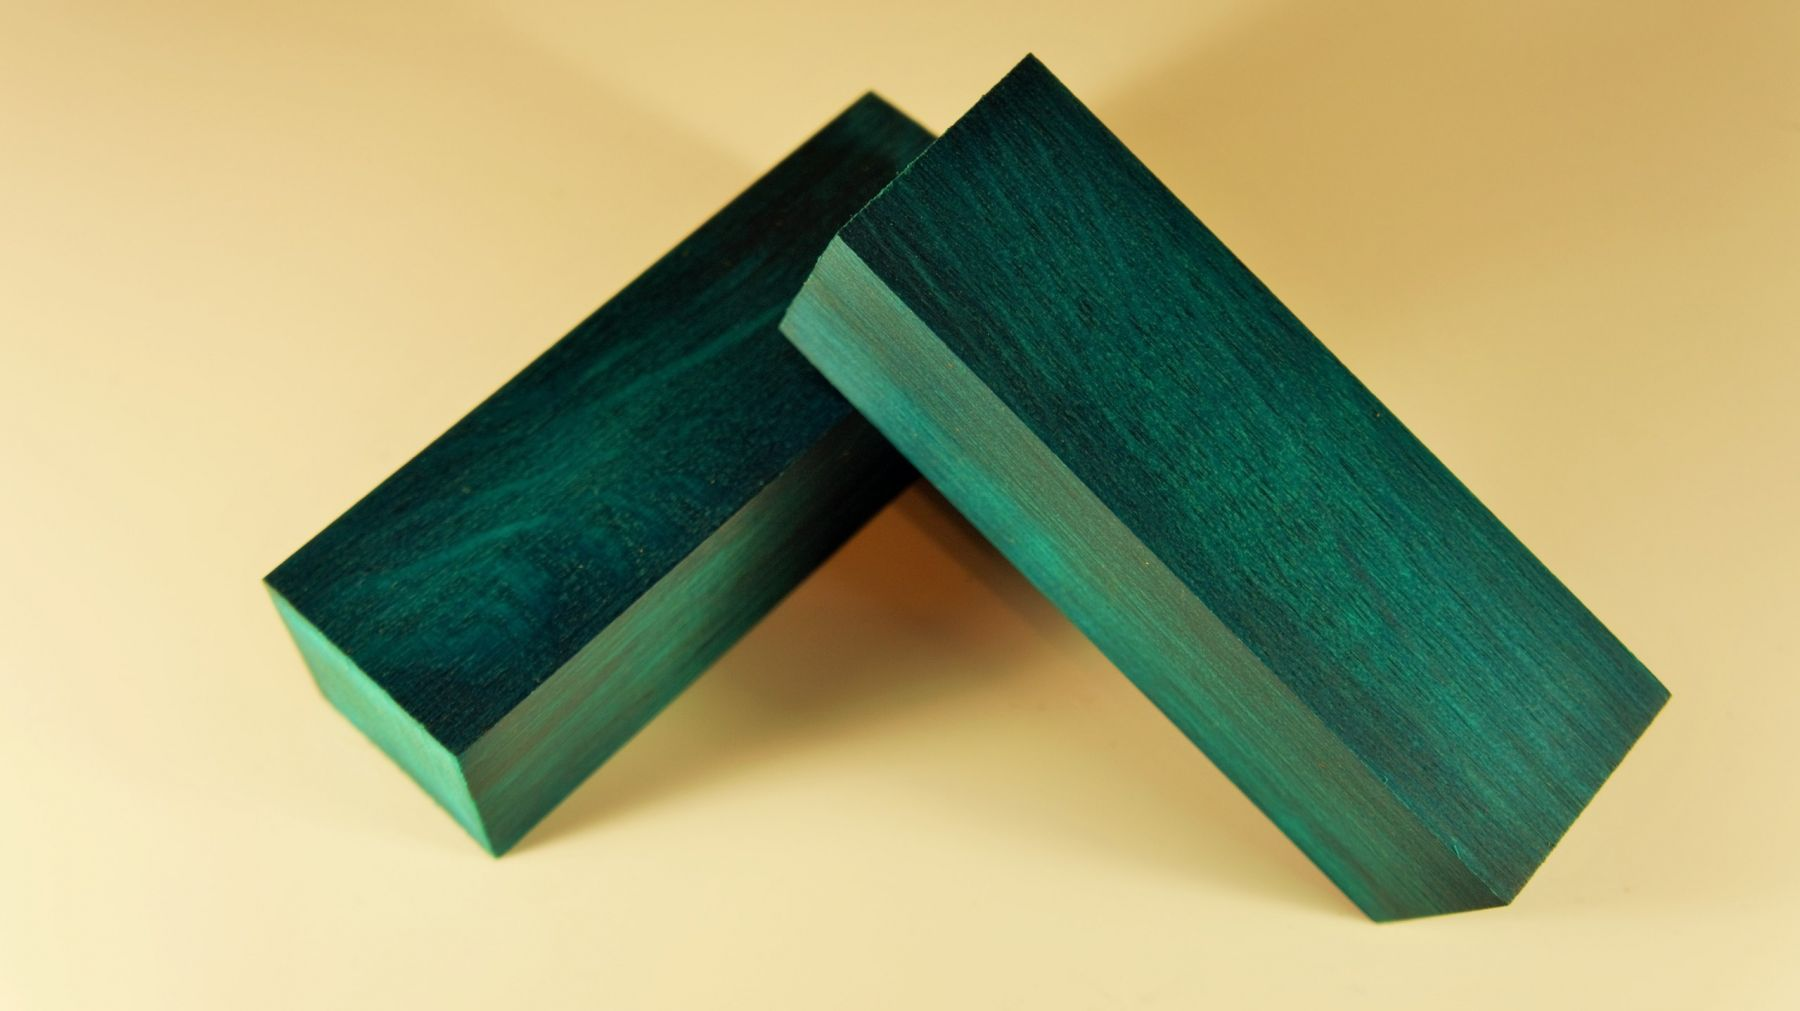 Изумрудный Граб плашки 5-7-10 мм на выбор (цена за 1 шт)